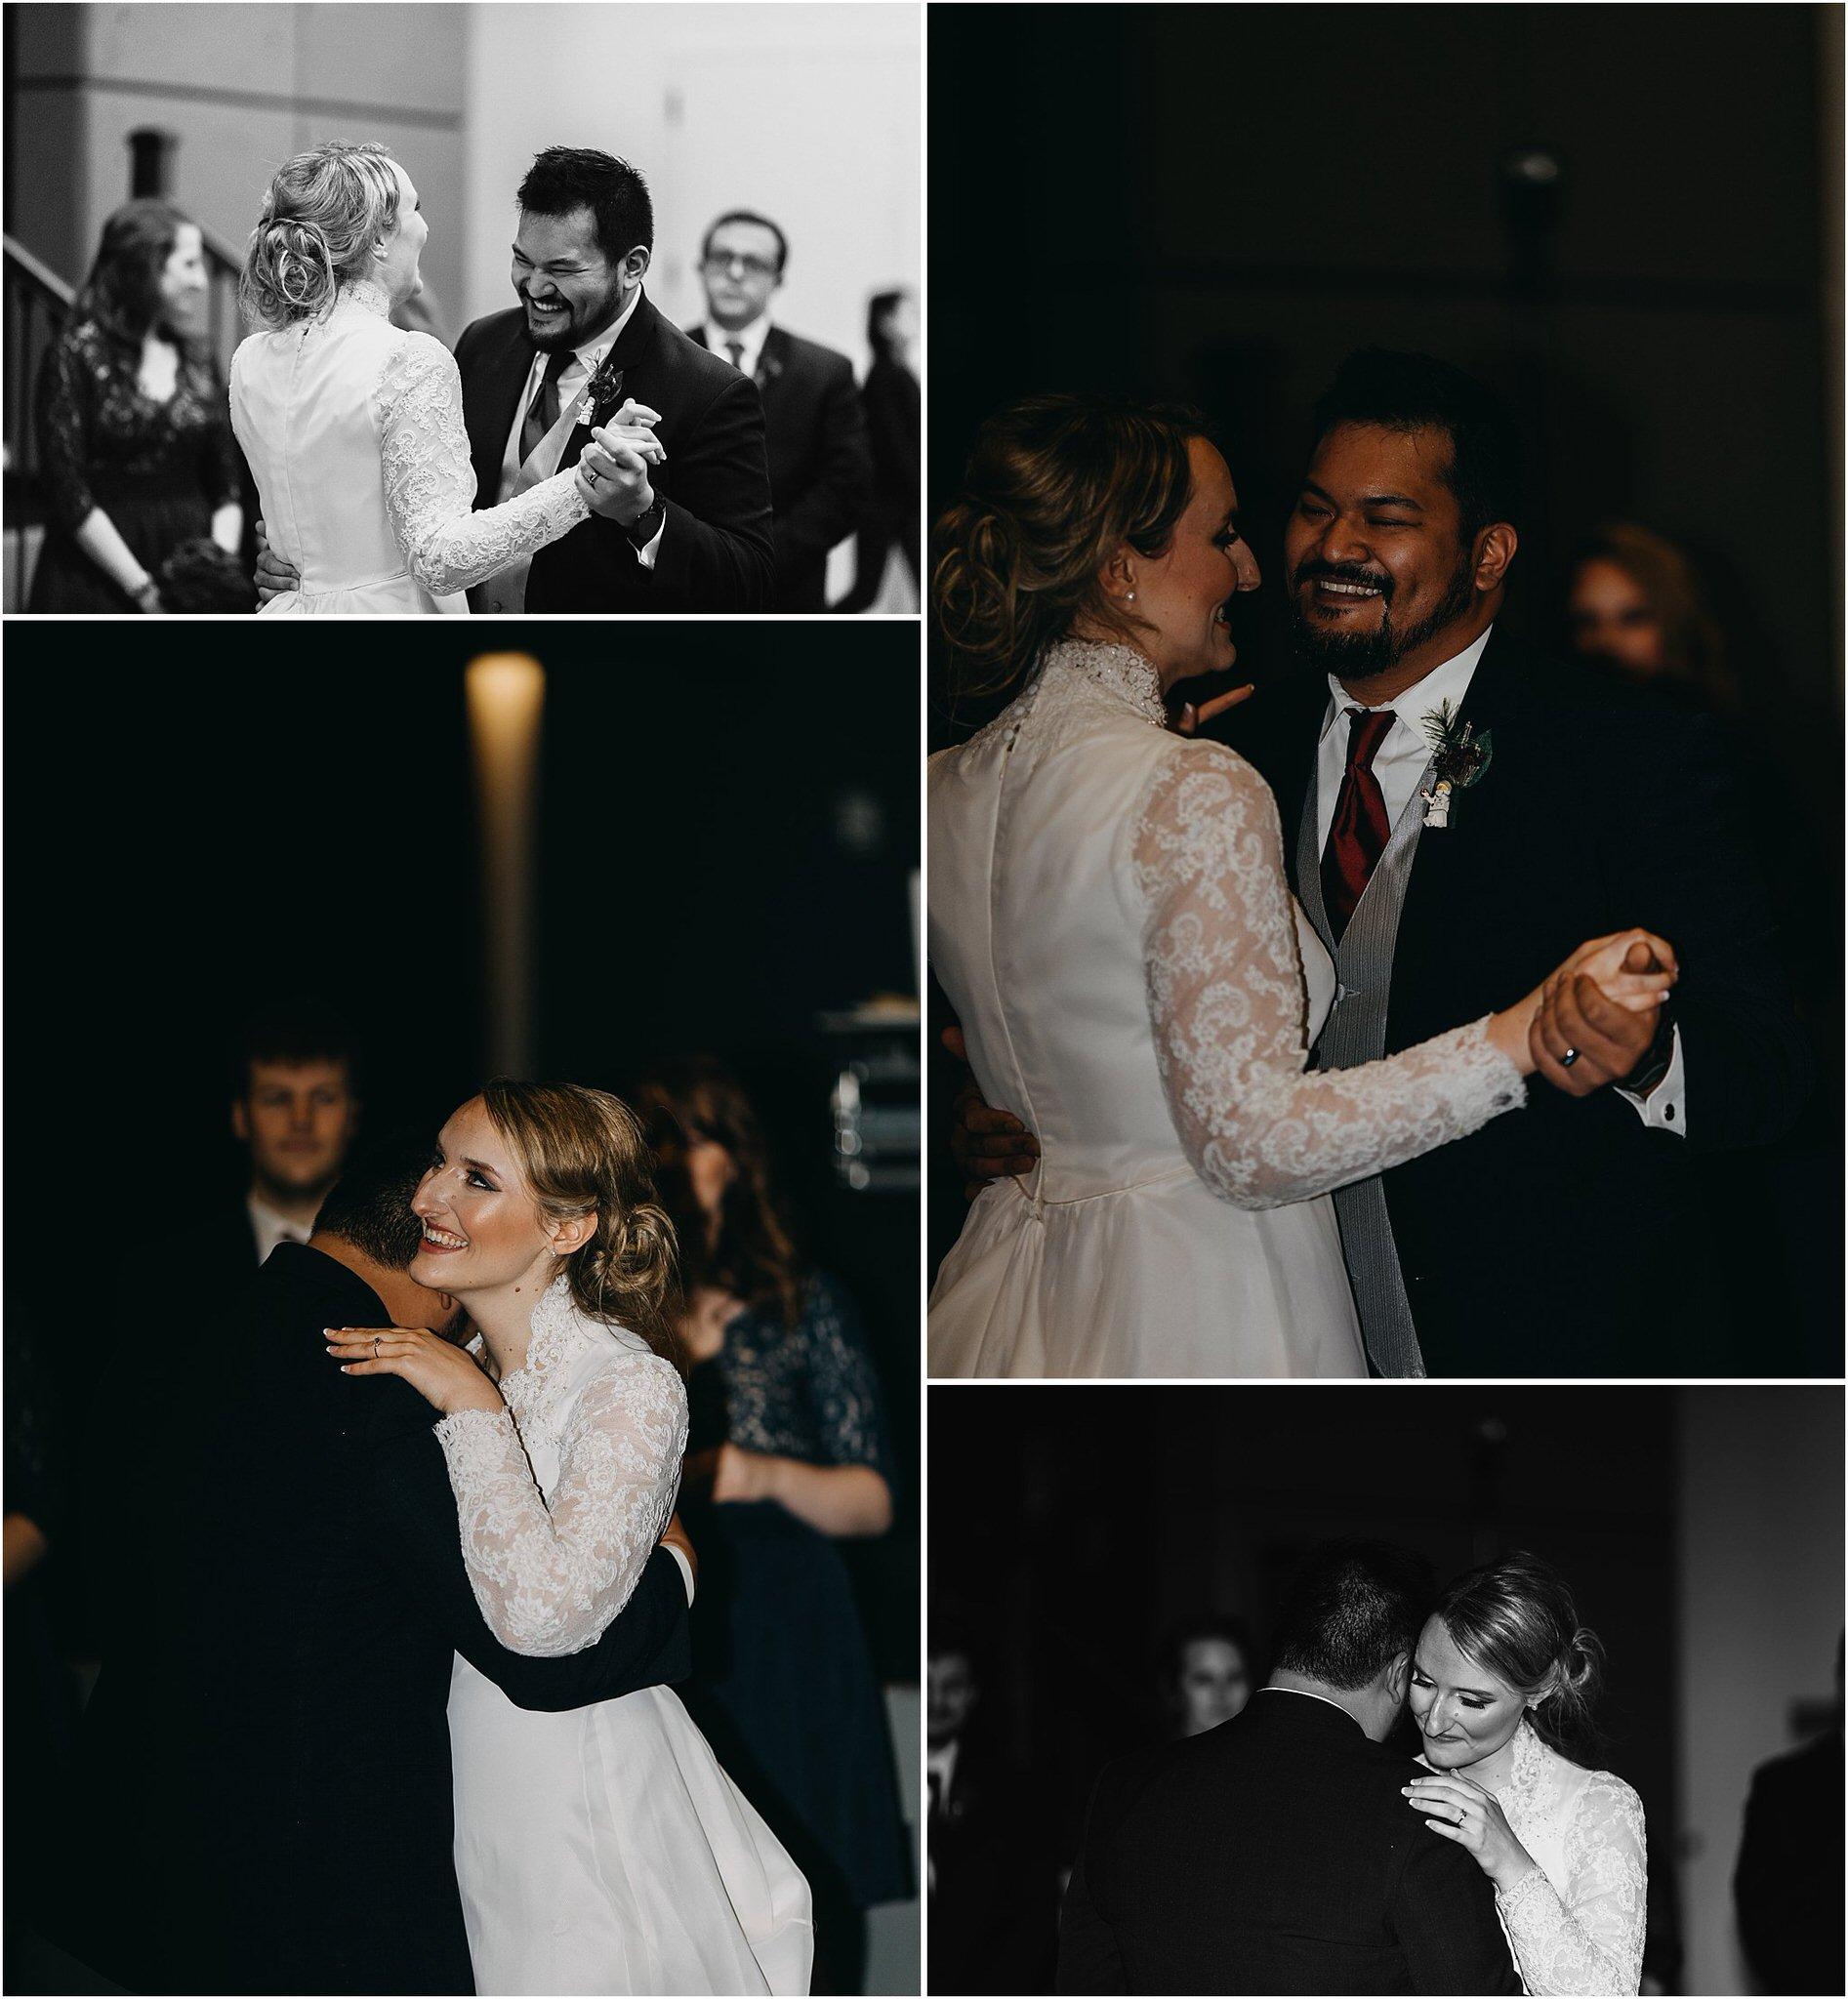 katy-robin-married-in-mukilteo-wedding38.jpg